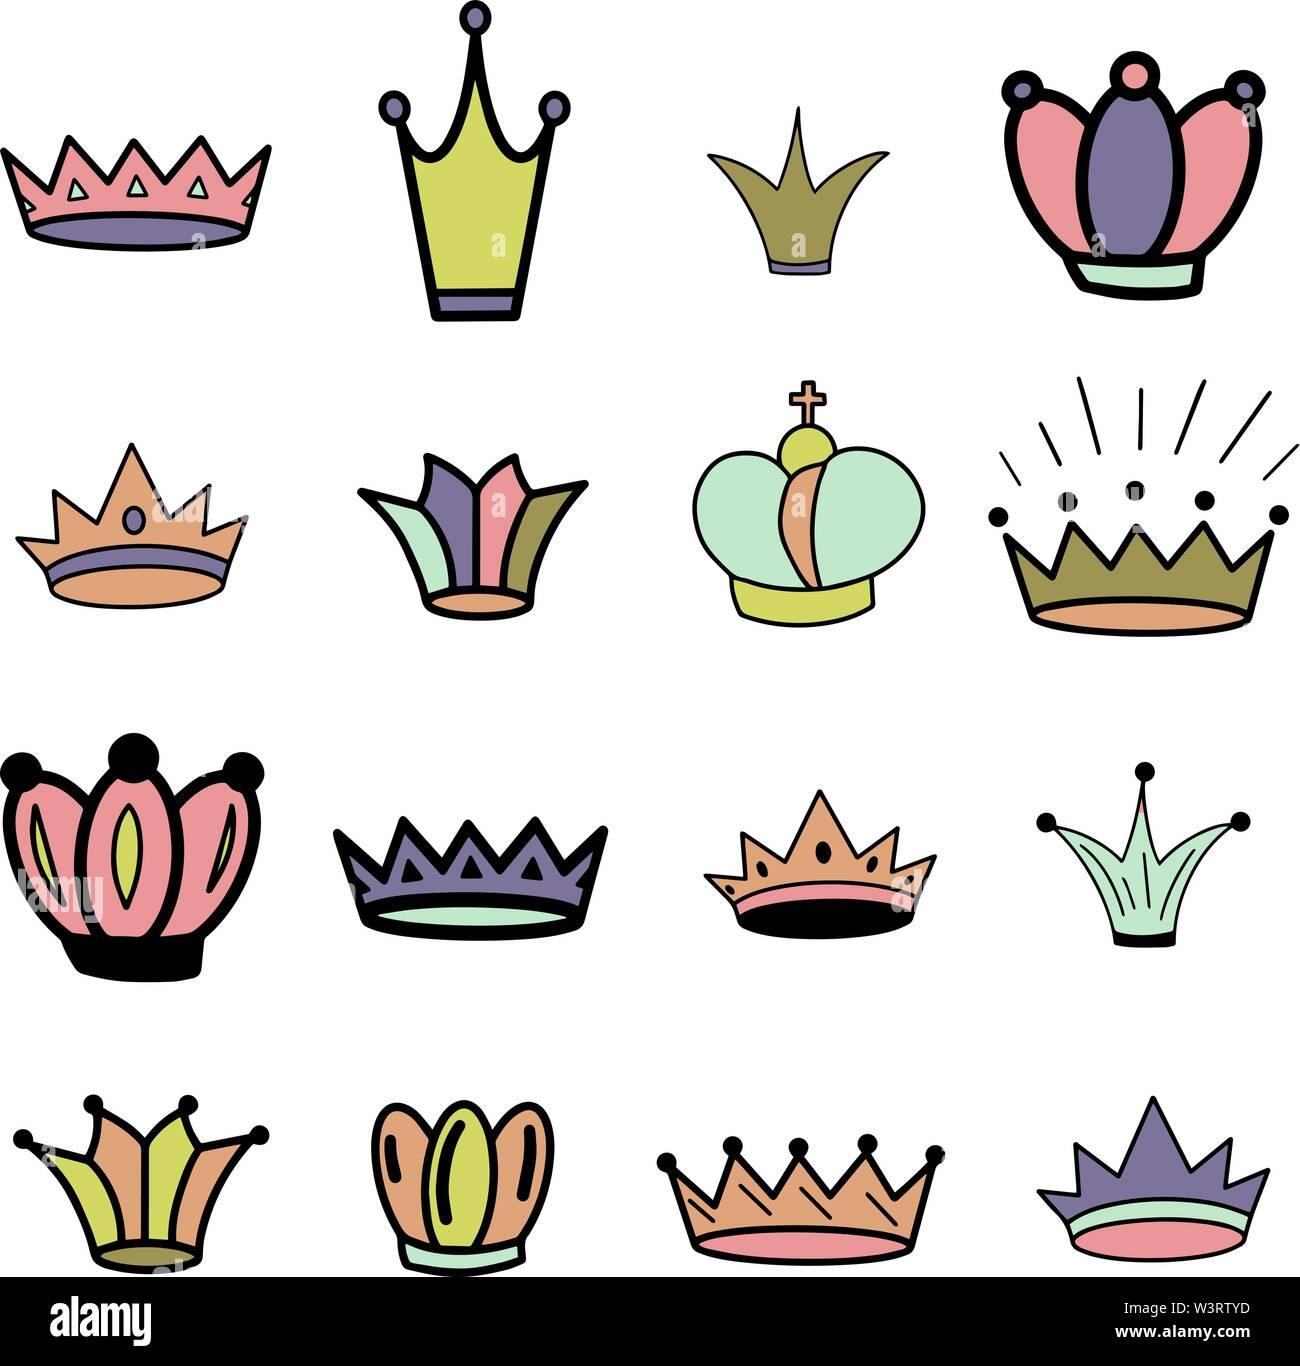 Crowns. Tiara. Diadem. Sketch crown. Hand drawn queen tiara, king crown. Royal imperial coronation symbols, monarch majestic jewel. Princess diadem. - Stock Image